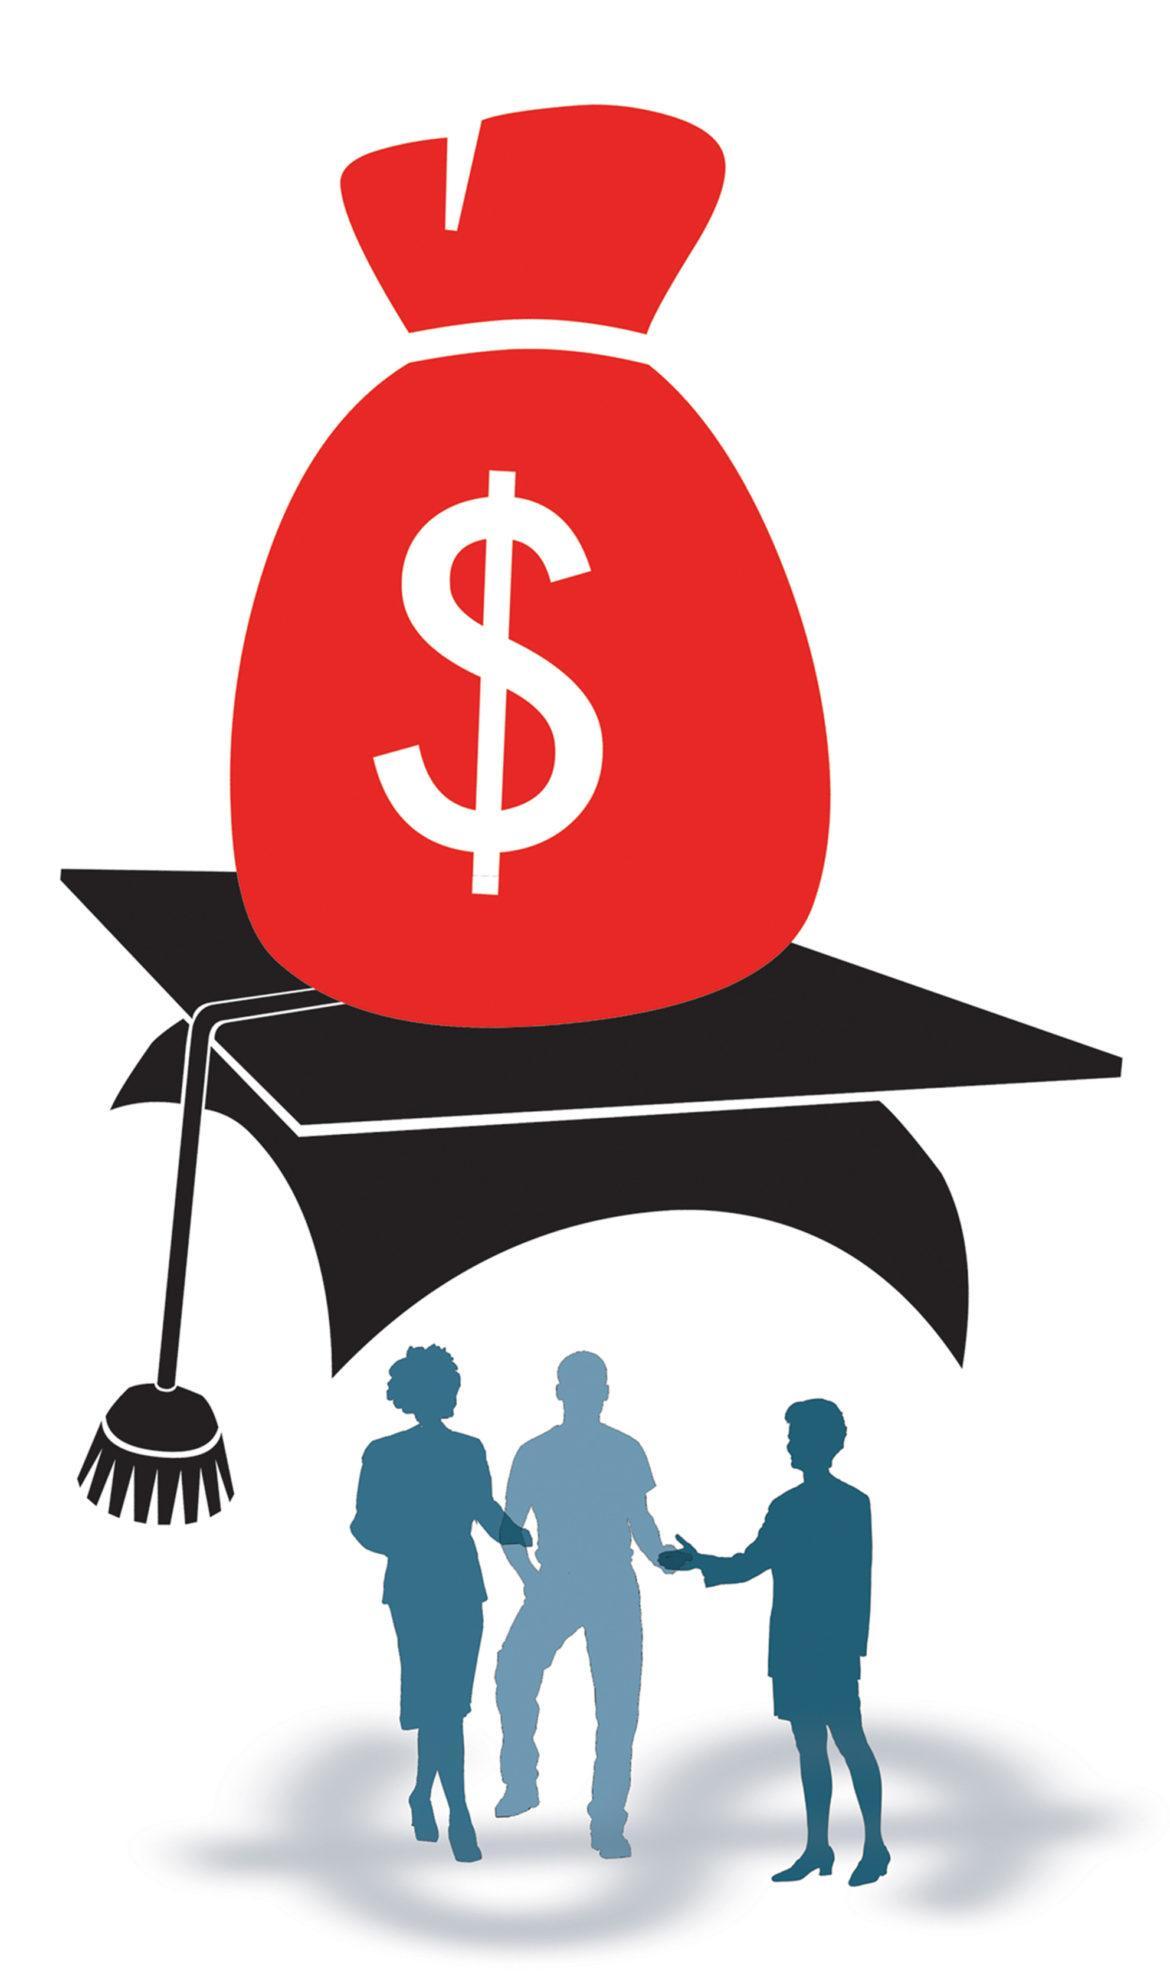 graphic shows a big money bag on top of a graduation cap